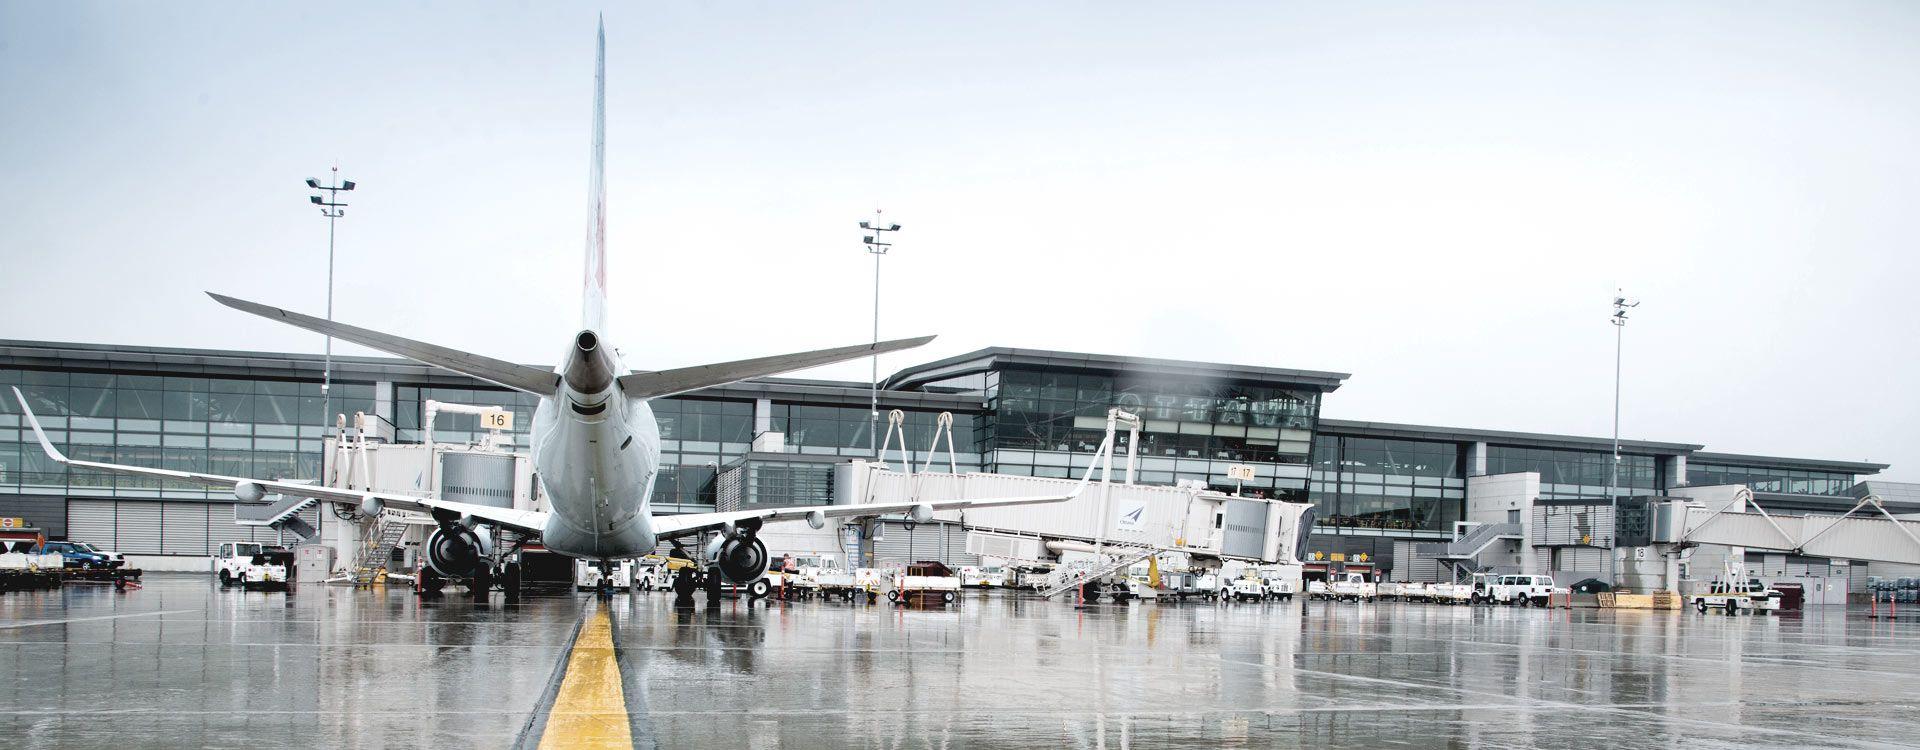 فرودگاه بین المللی اتاوا کانادا